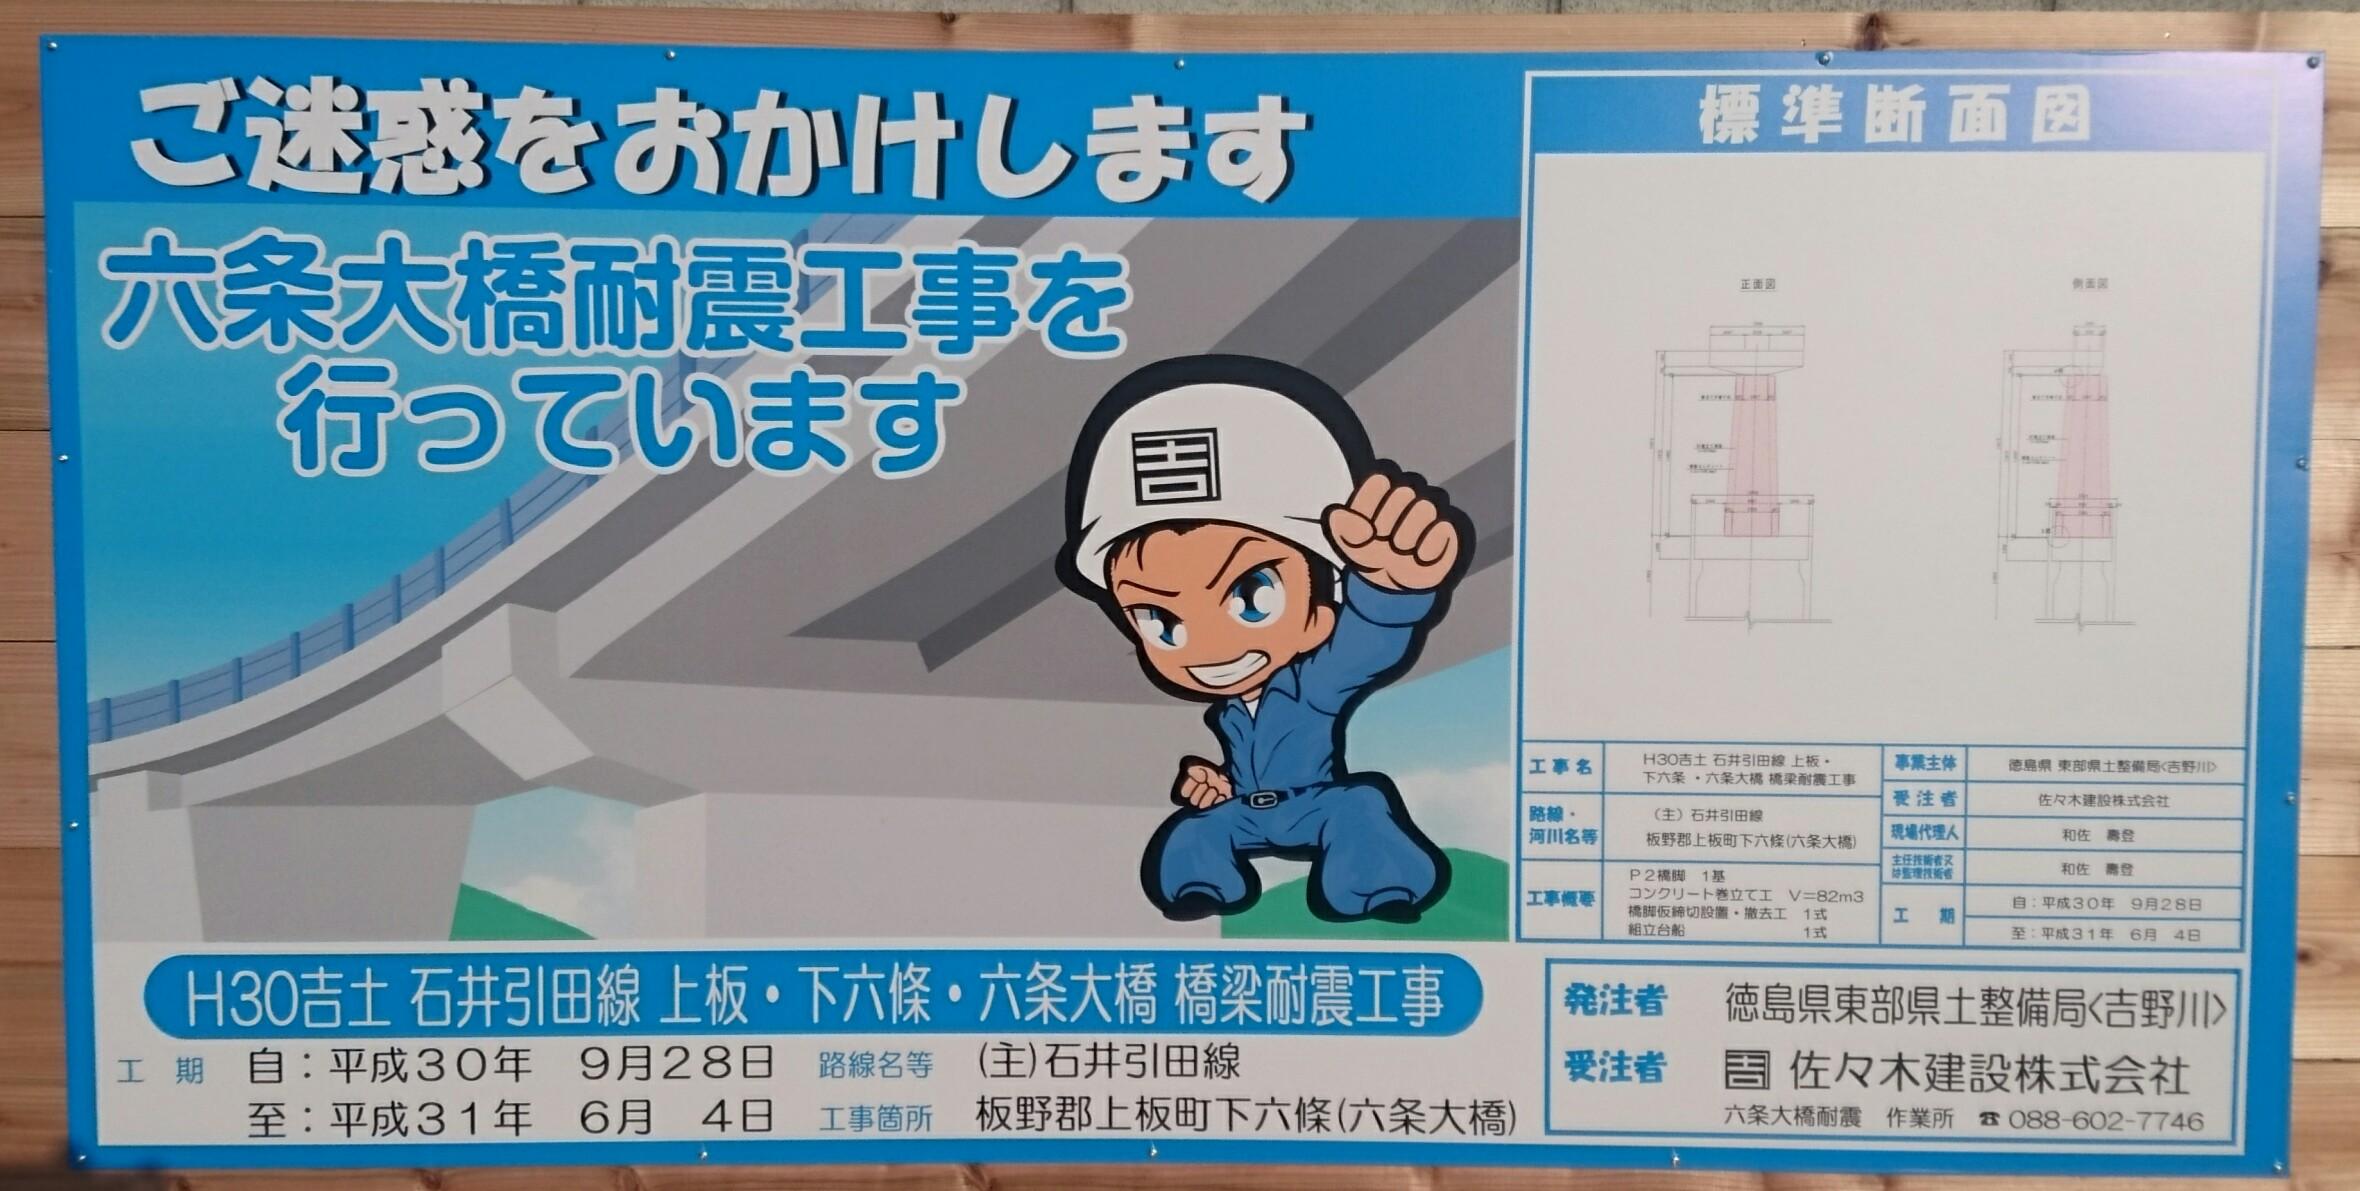 佐々木建設(株) 橋の耐震工事